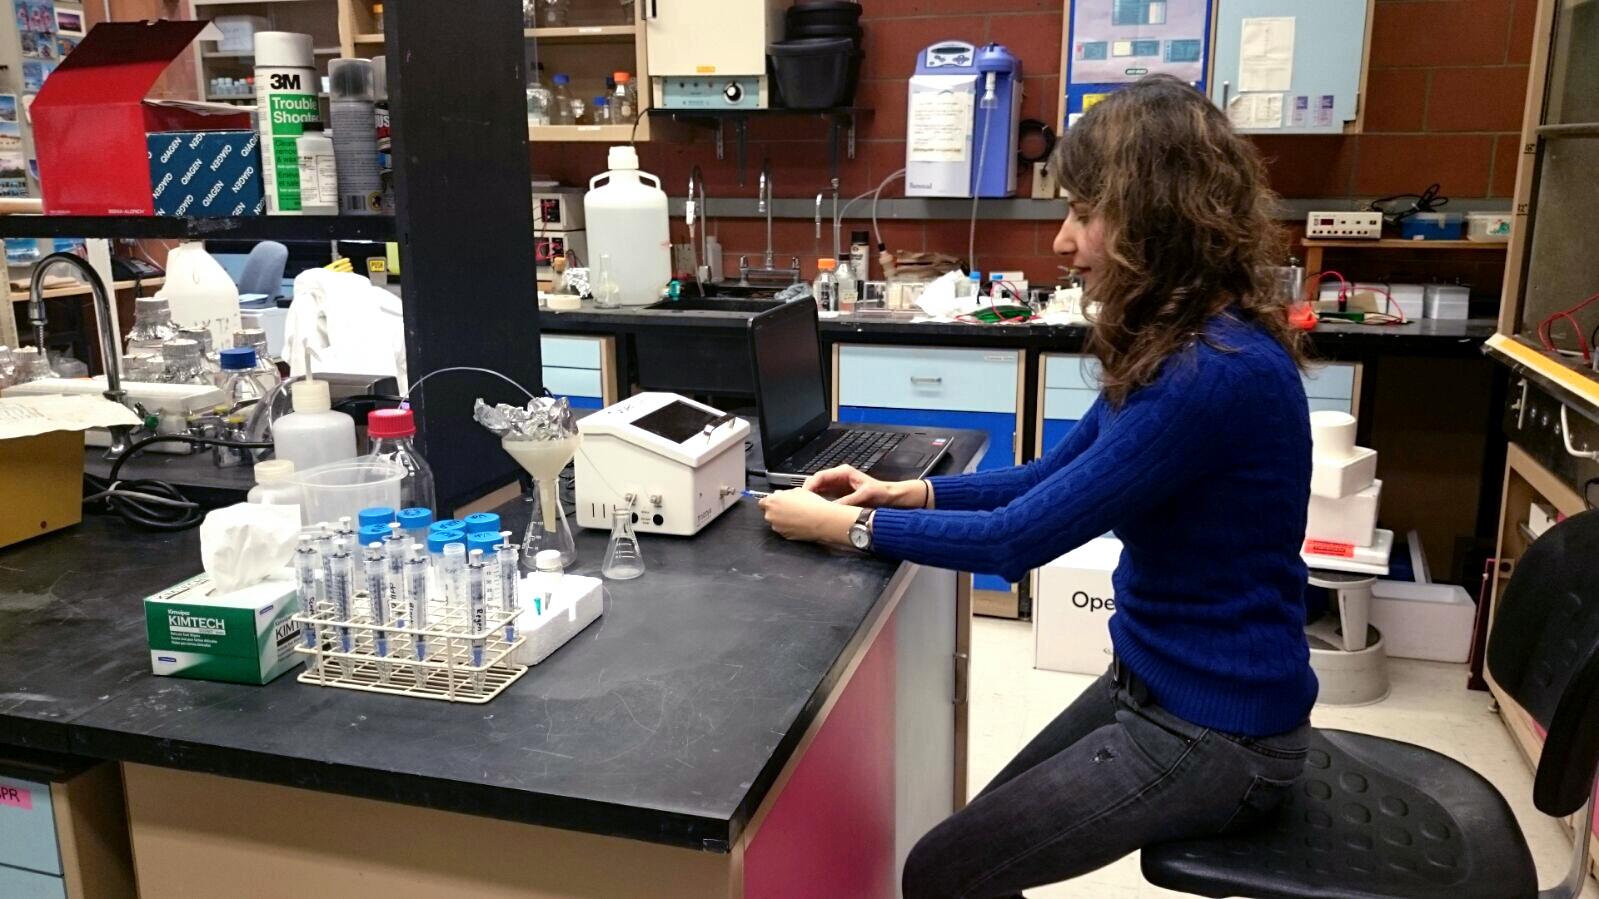 Graduate student of Dr. George Espie, Maryam Moazami-Goudarzi using Nicoya's benchtop OpenSPR.